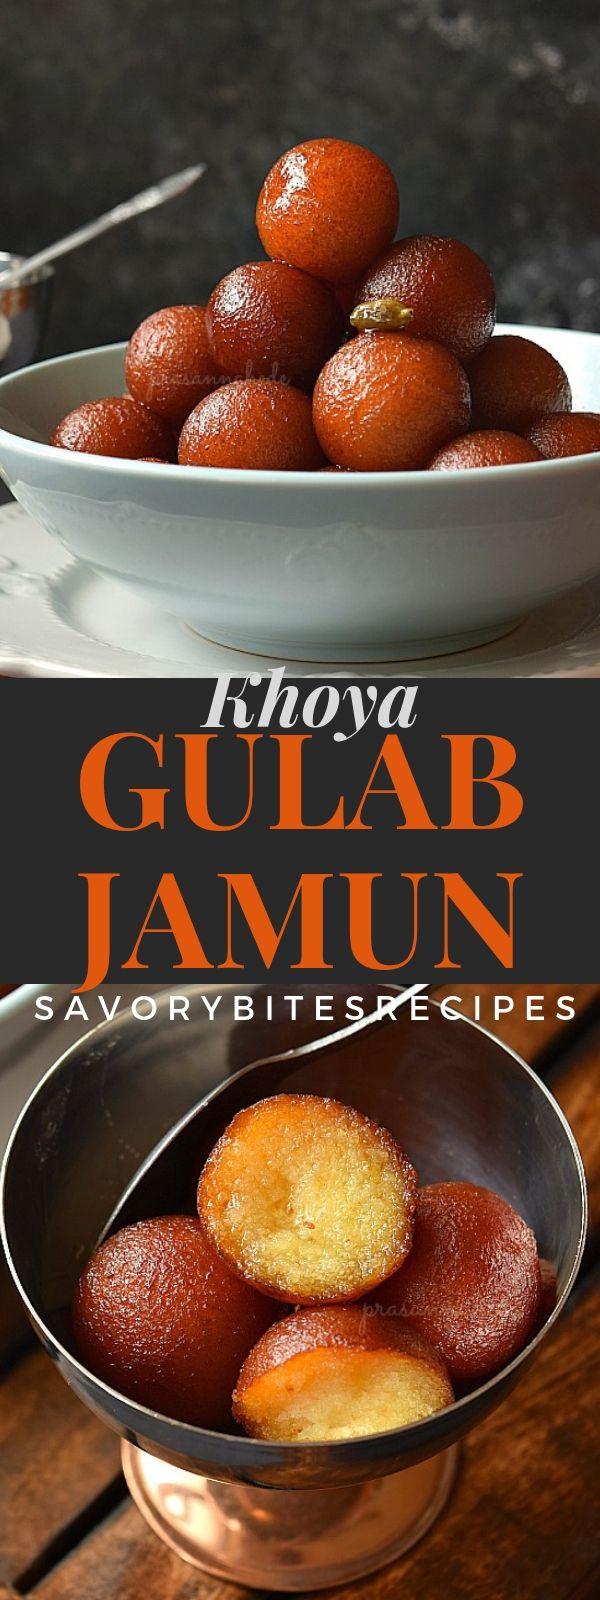 Gulab Jamun Recipe(Gulab Jamun made with Khoya)   Savory Bites